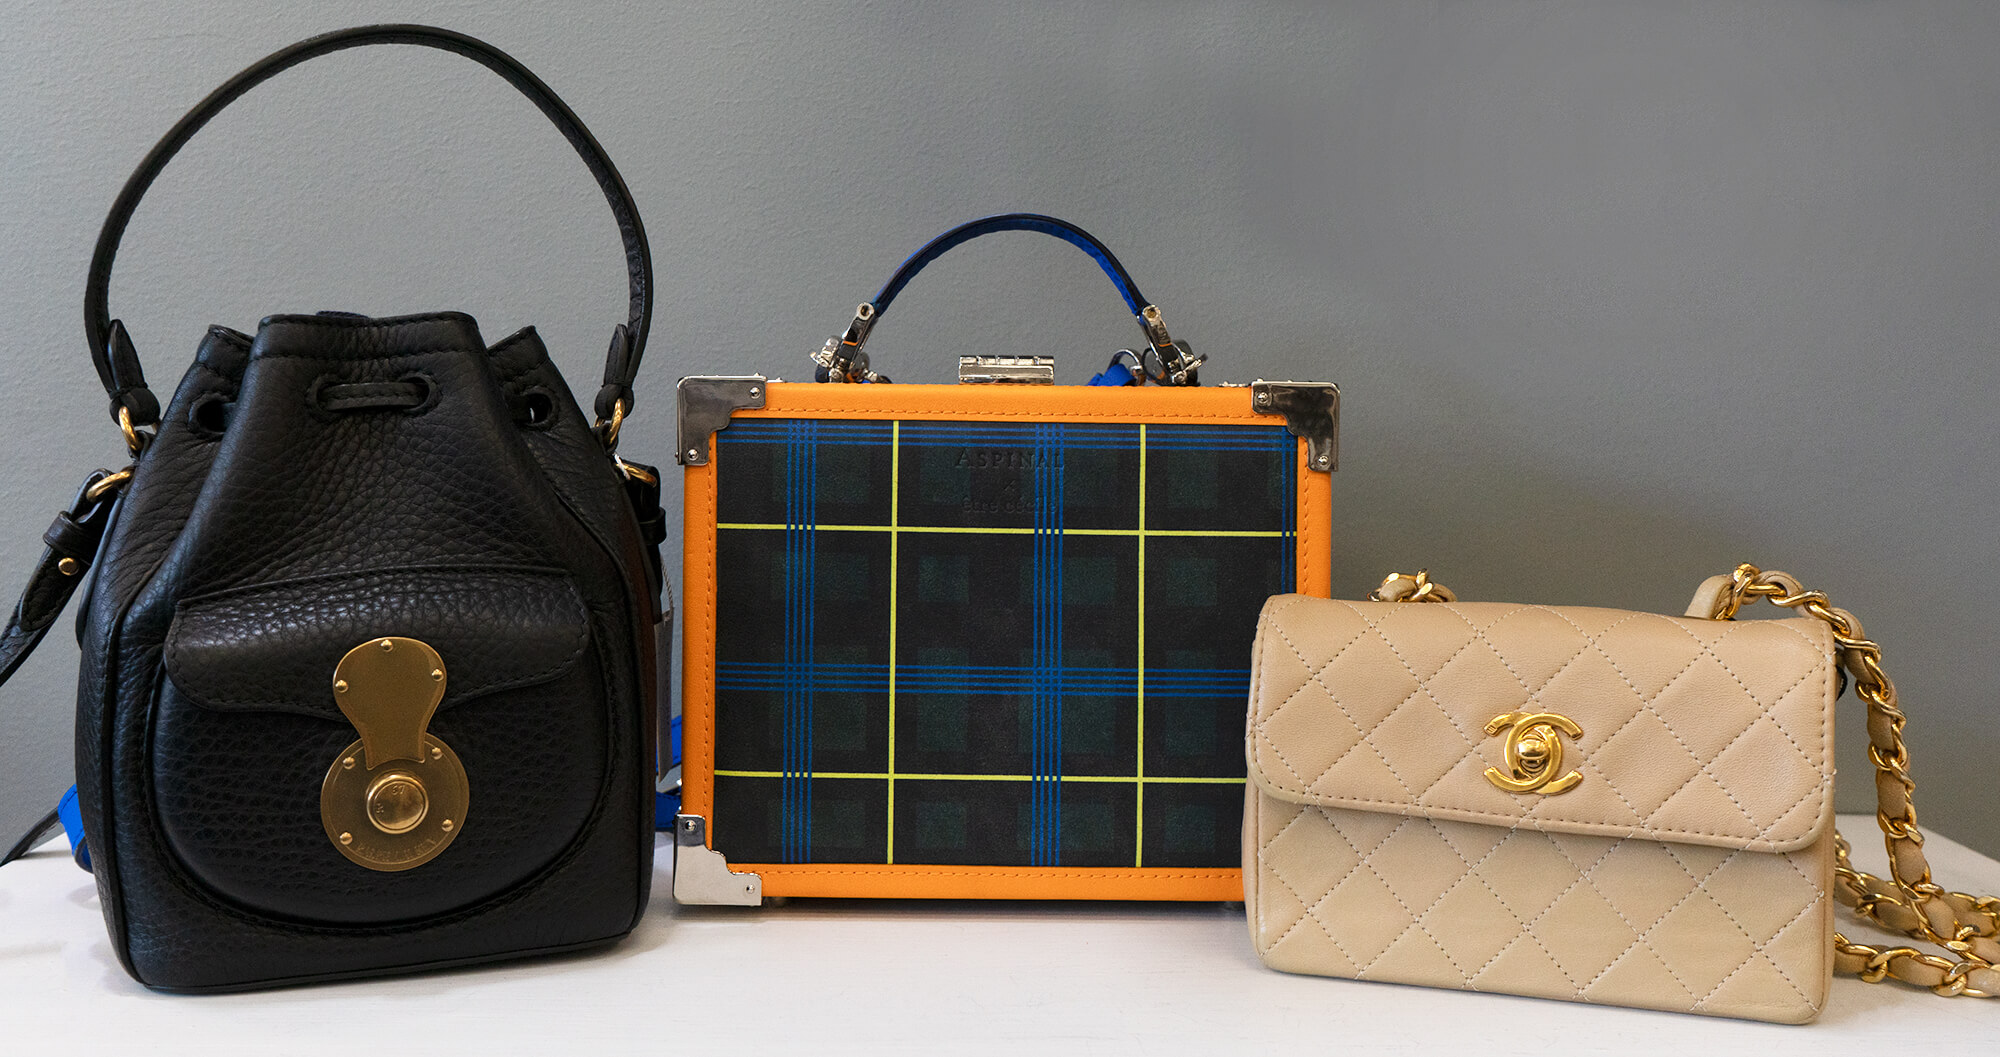 image of small handbags fall fashion trends